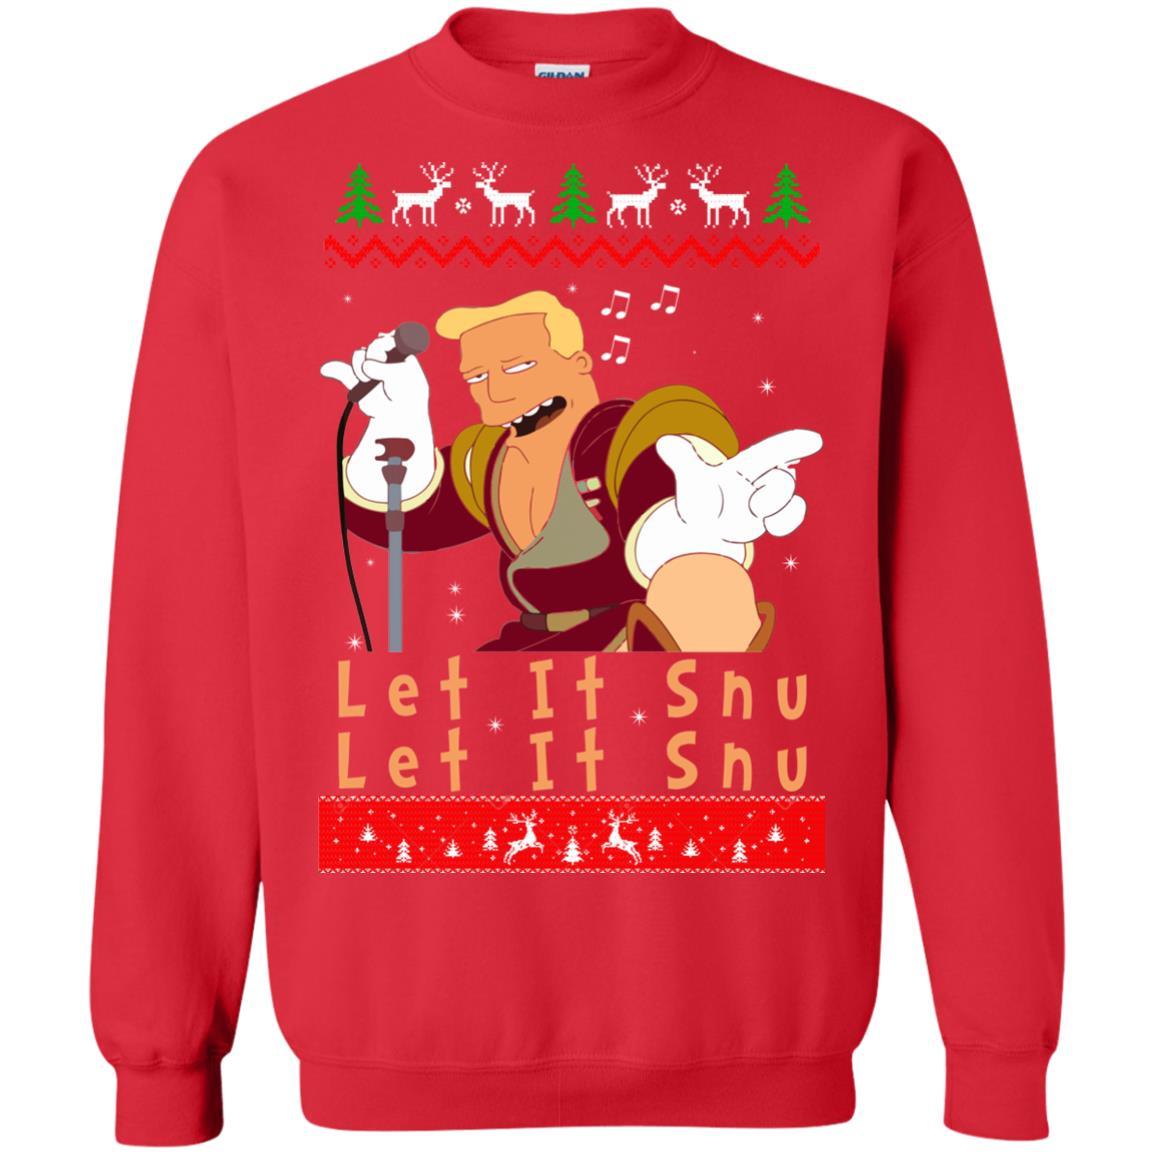 image 720 - Zapp Brannigan Let It Snu Christmas Sweatshirt, Hoodie